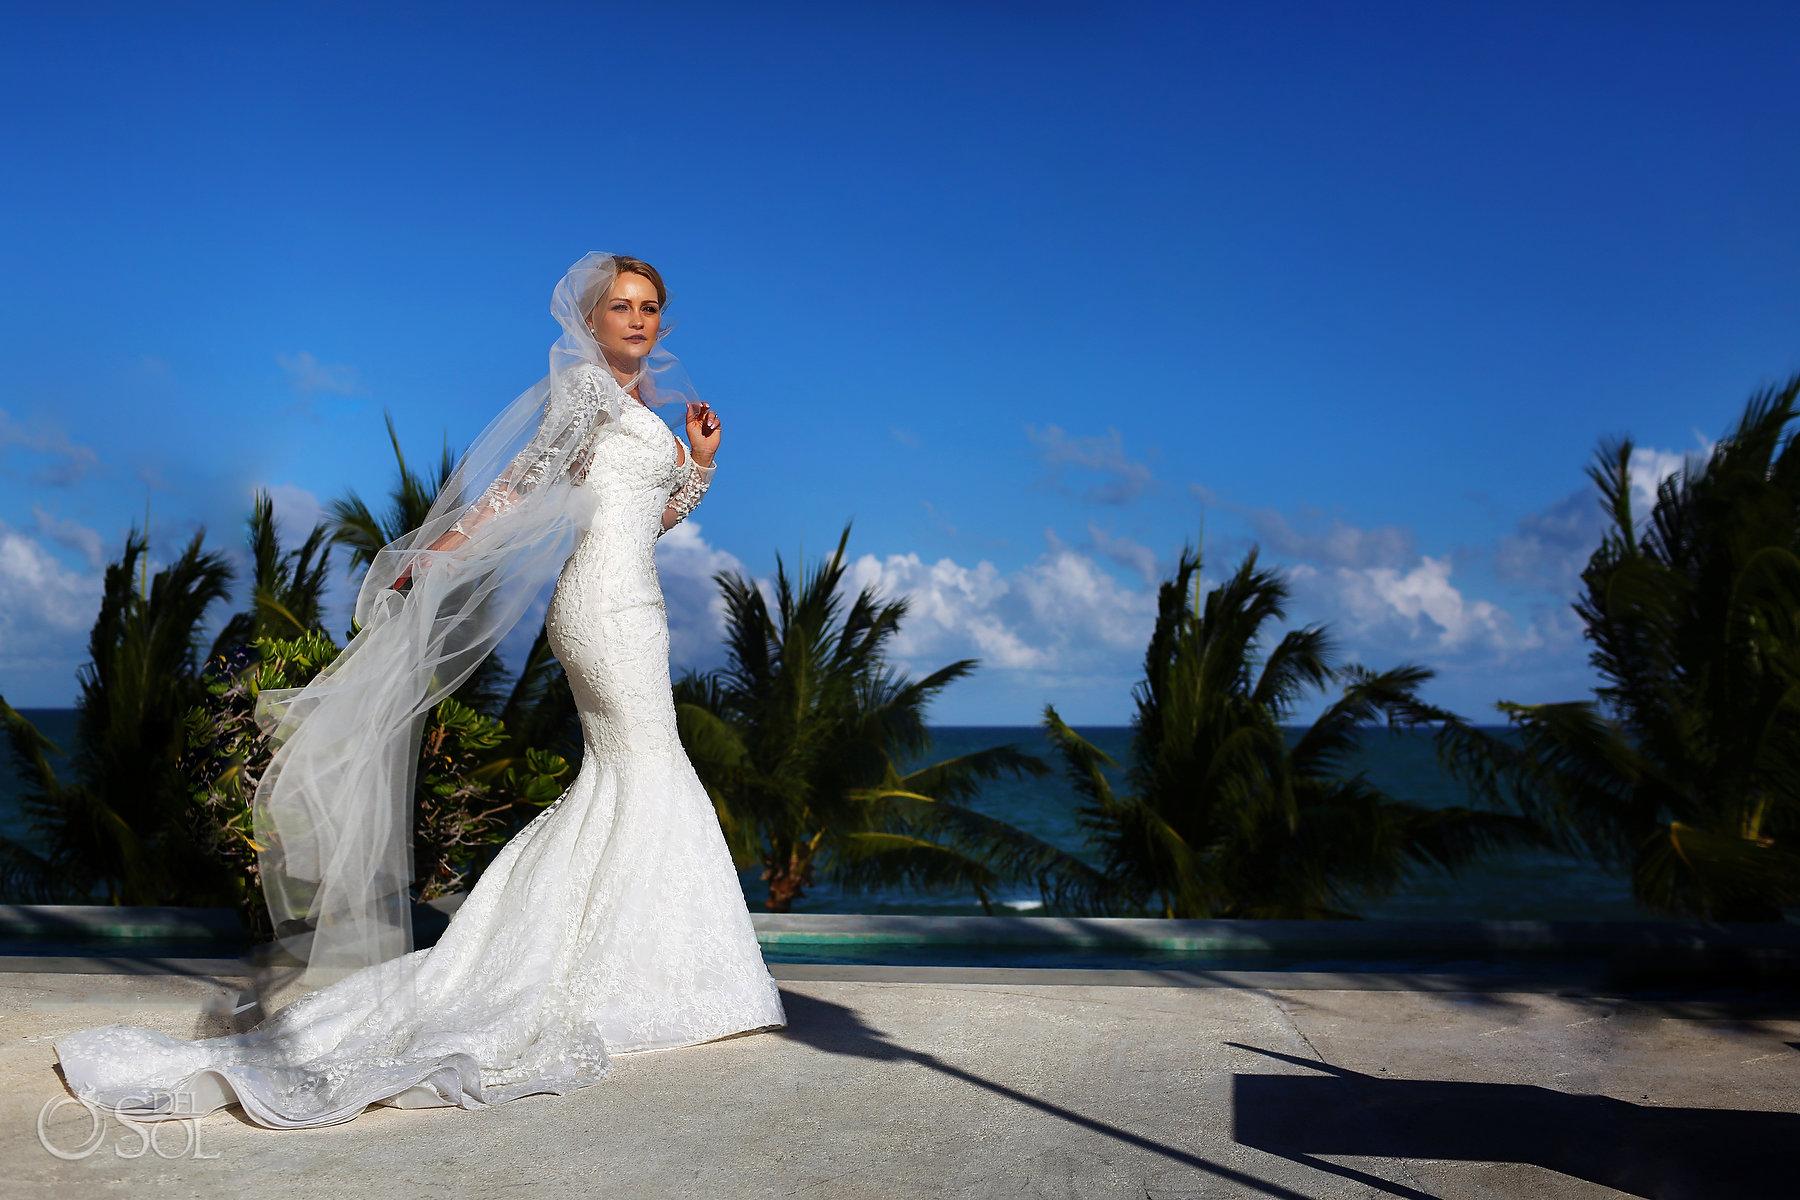 bride wearing Adrianna Papell wedding dress long bridal veil blue diamond luxury boutique hotel